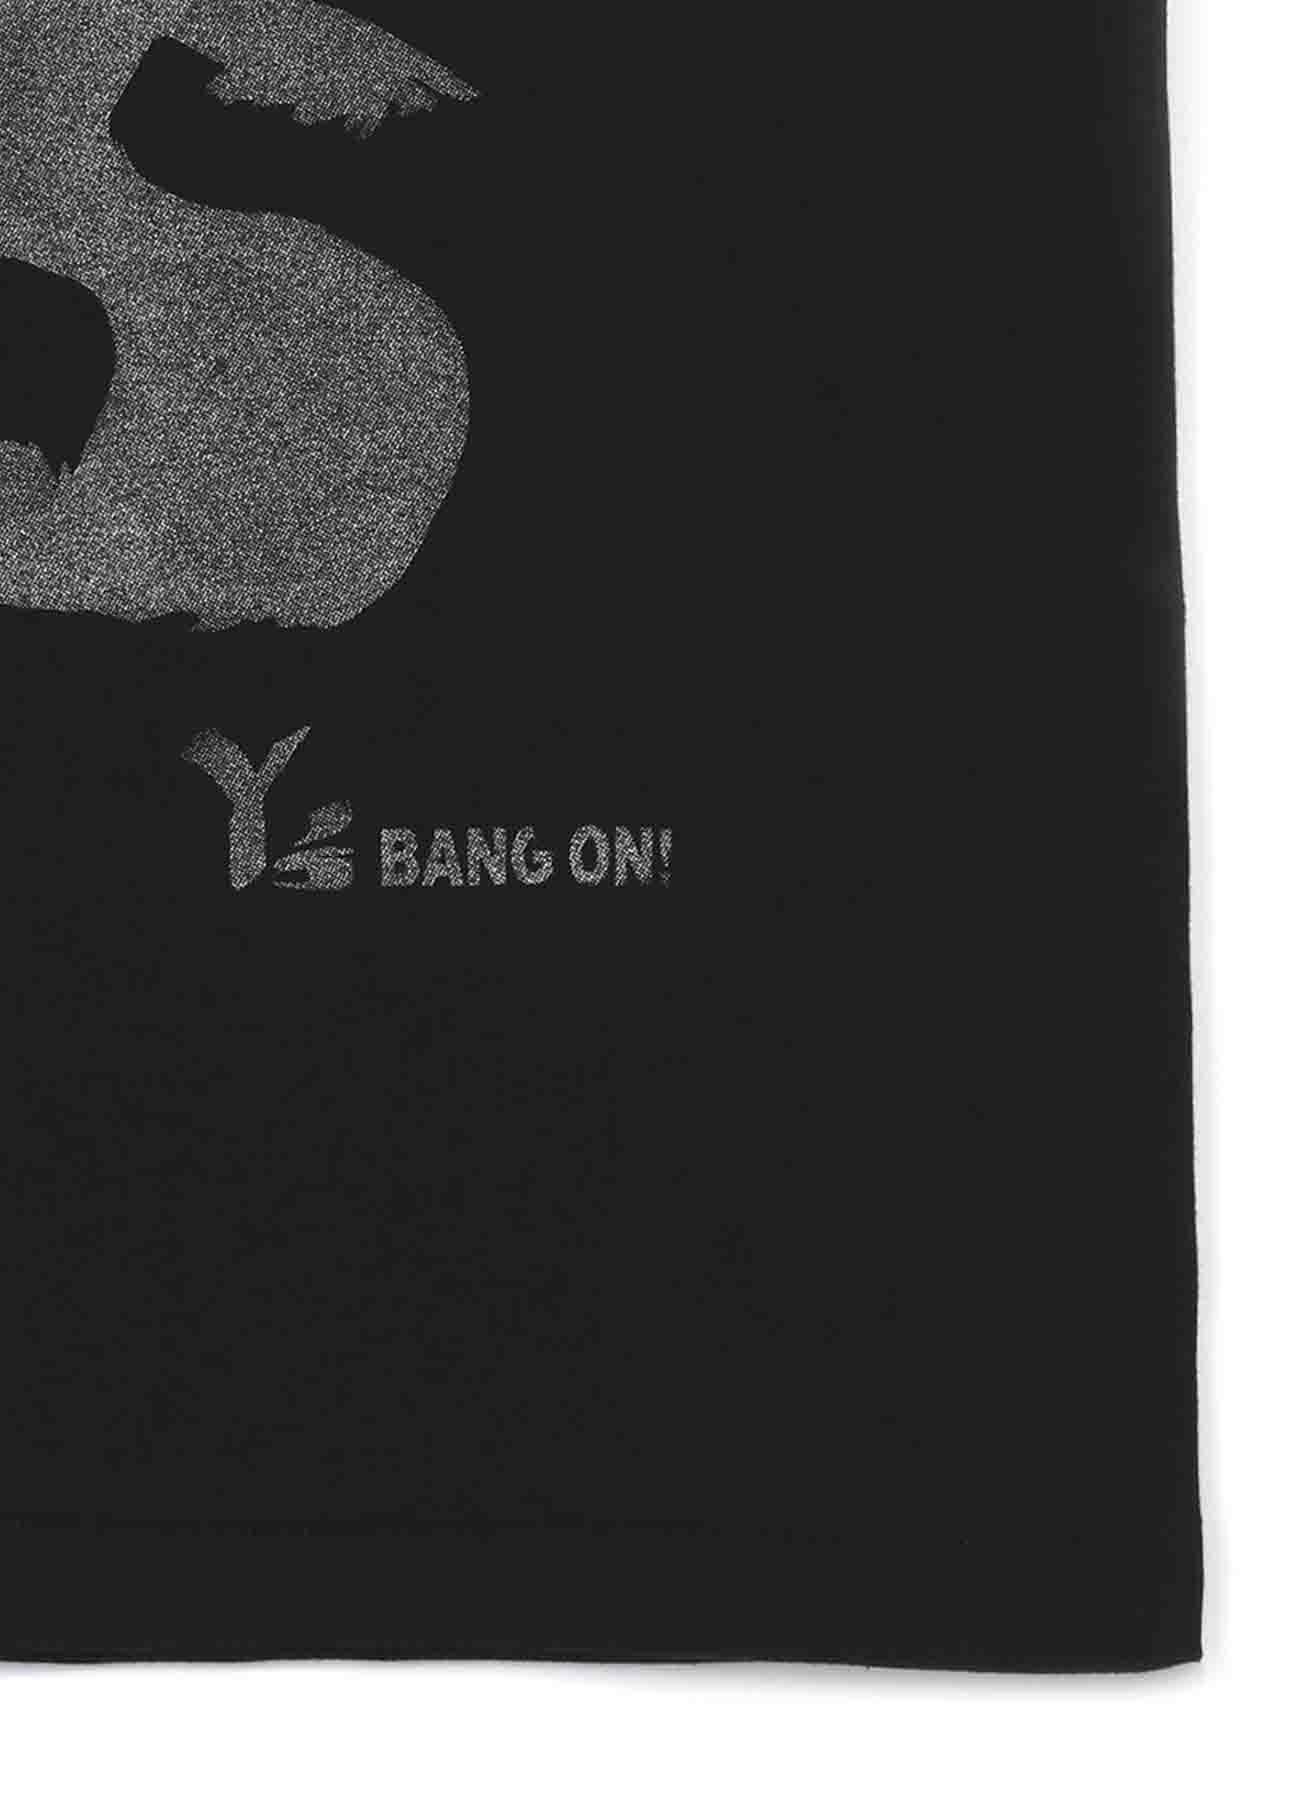 Y's BANG ON! デカロゴTシャツ シルバー